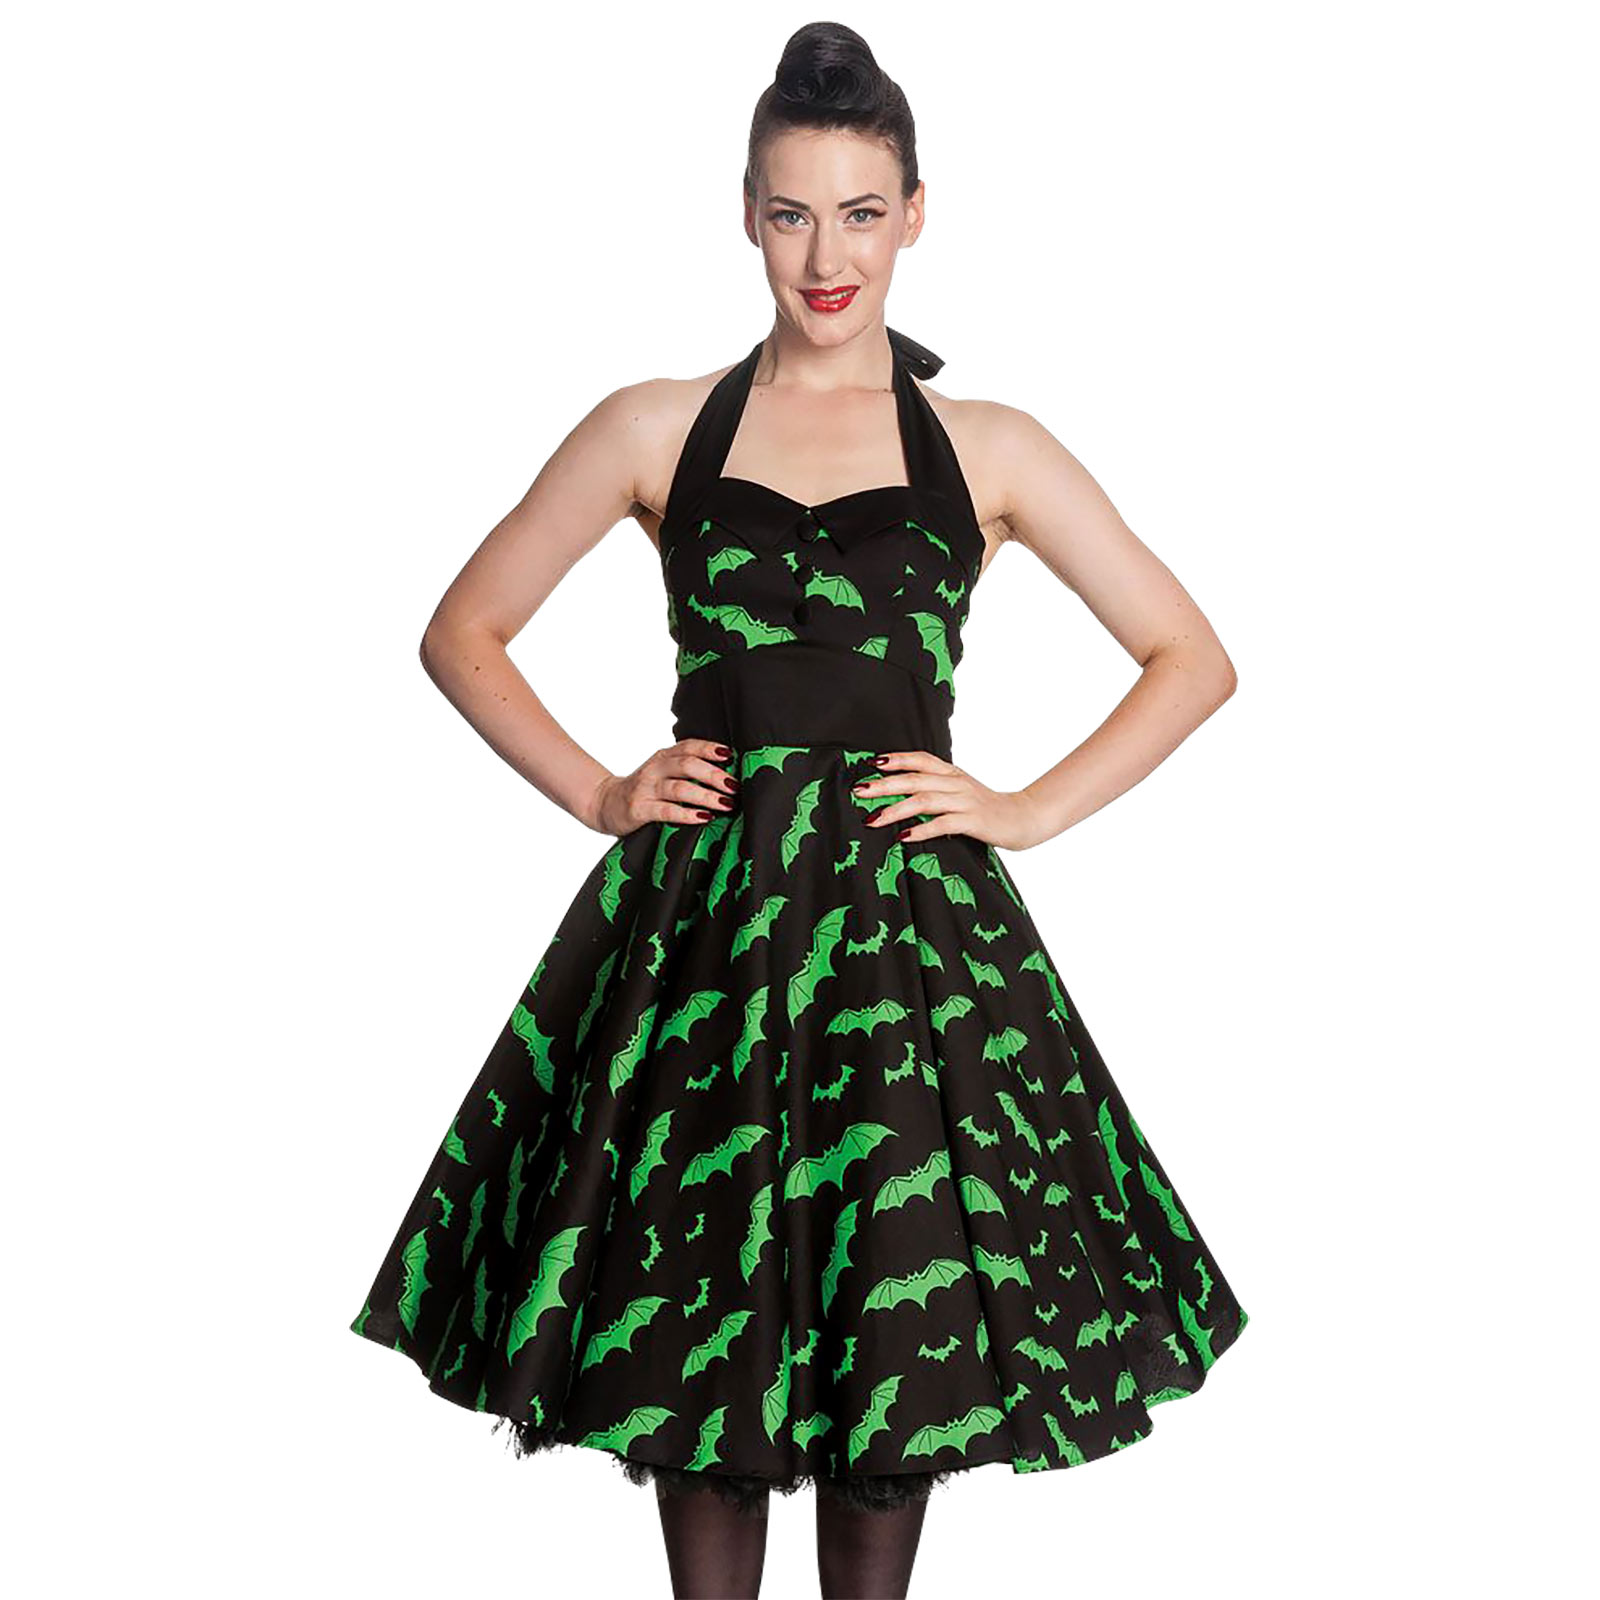 Rockabilly-Kleid Bat schwarz-grün